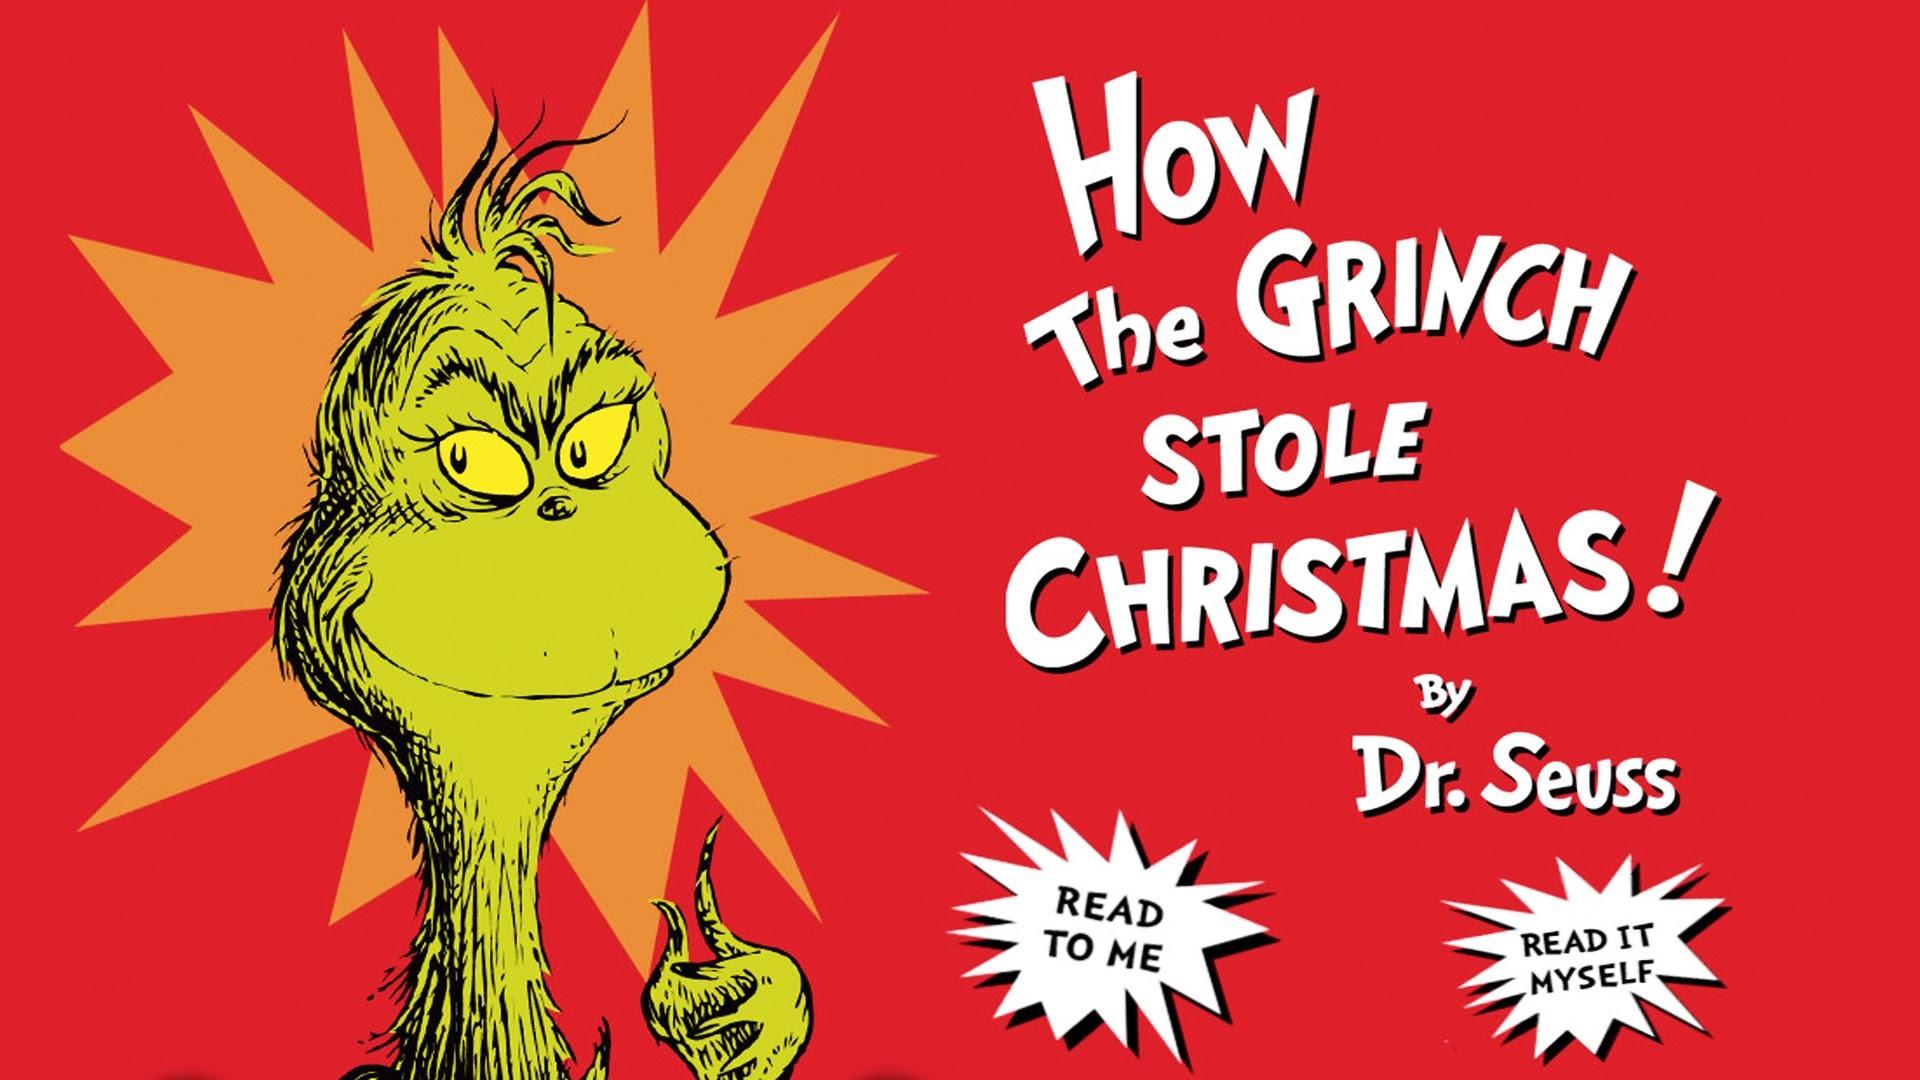 1920x1080 dr seuss how the grinch stole christmas 2000 movie review youtube - How The Grinch Stole Christmas Youtube